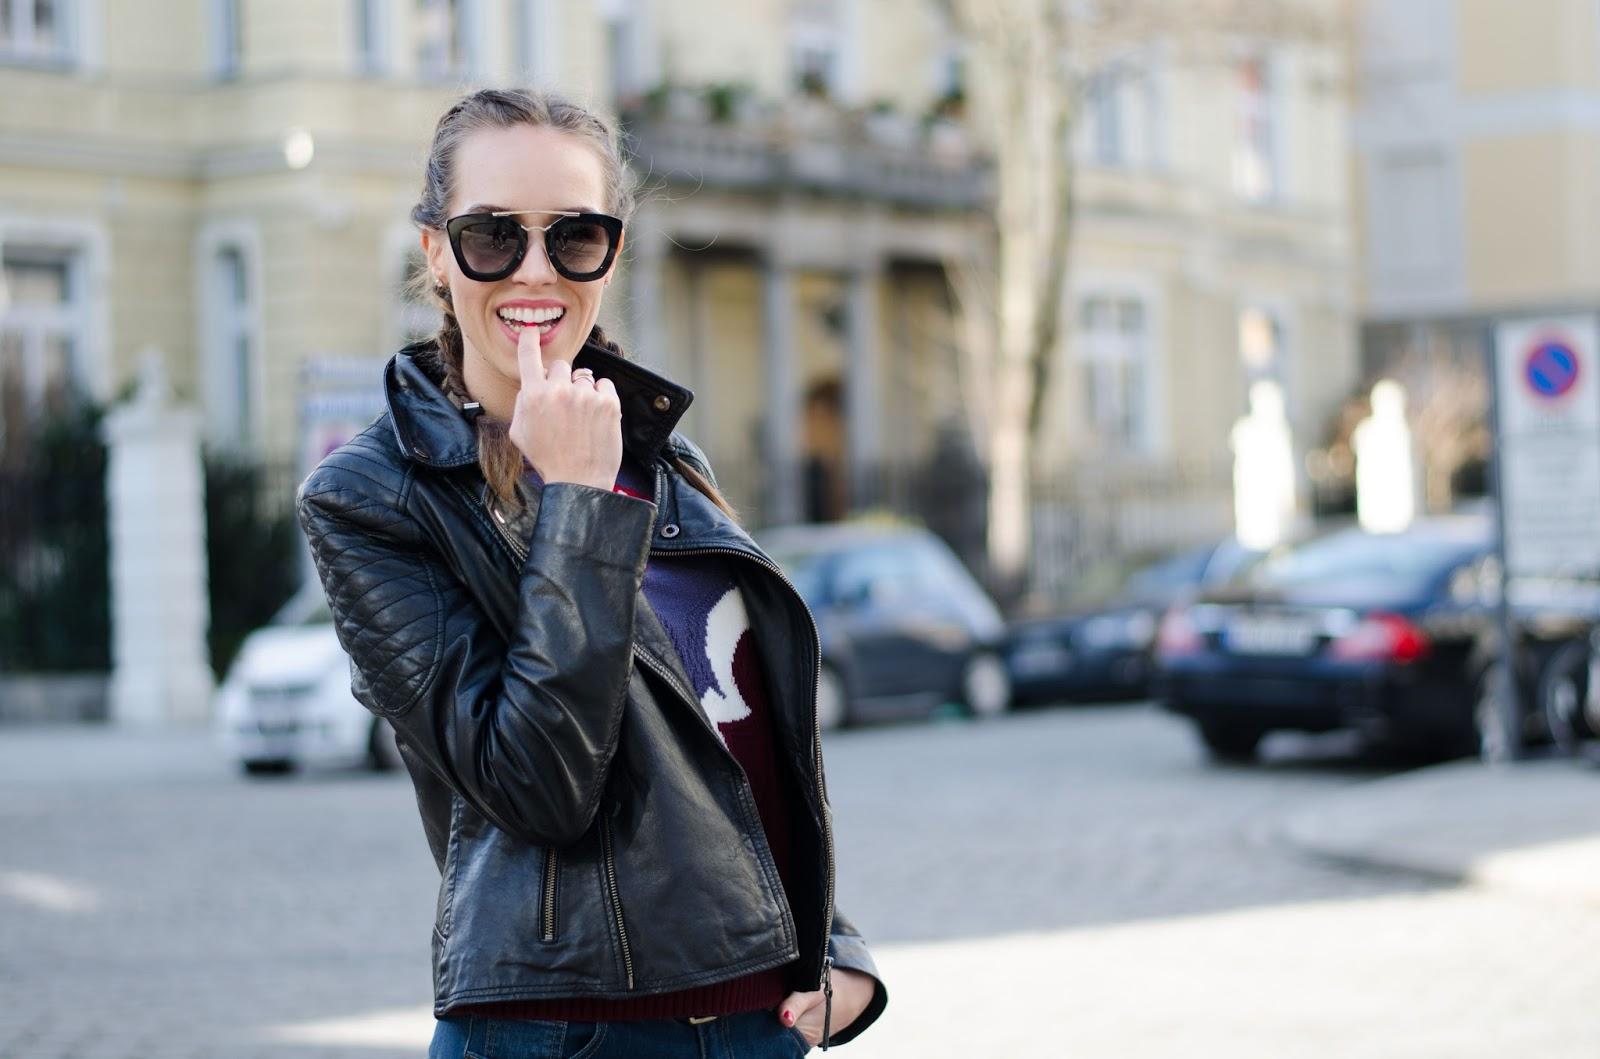 kristjaana mere prada sunglasses barneys leather jacket dutch braids